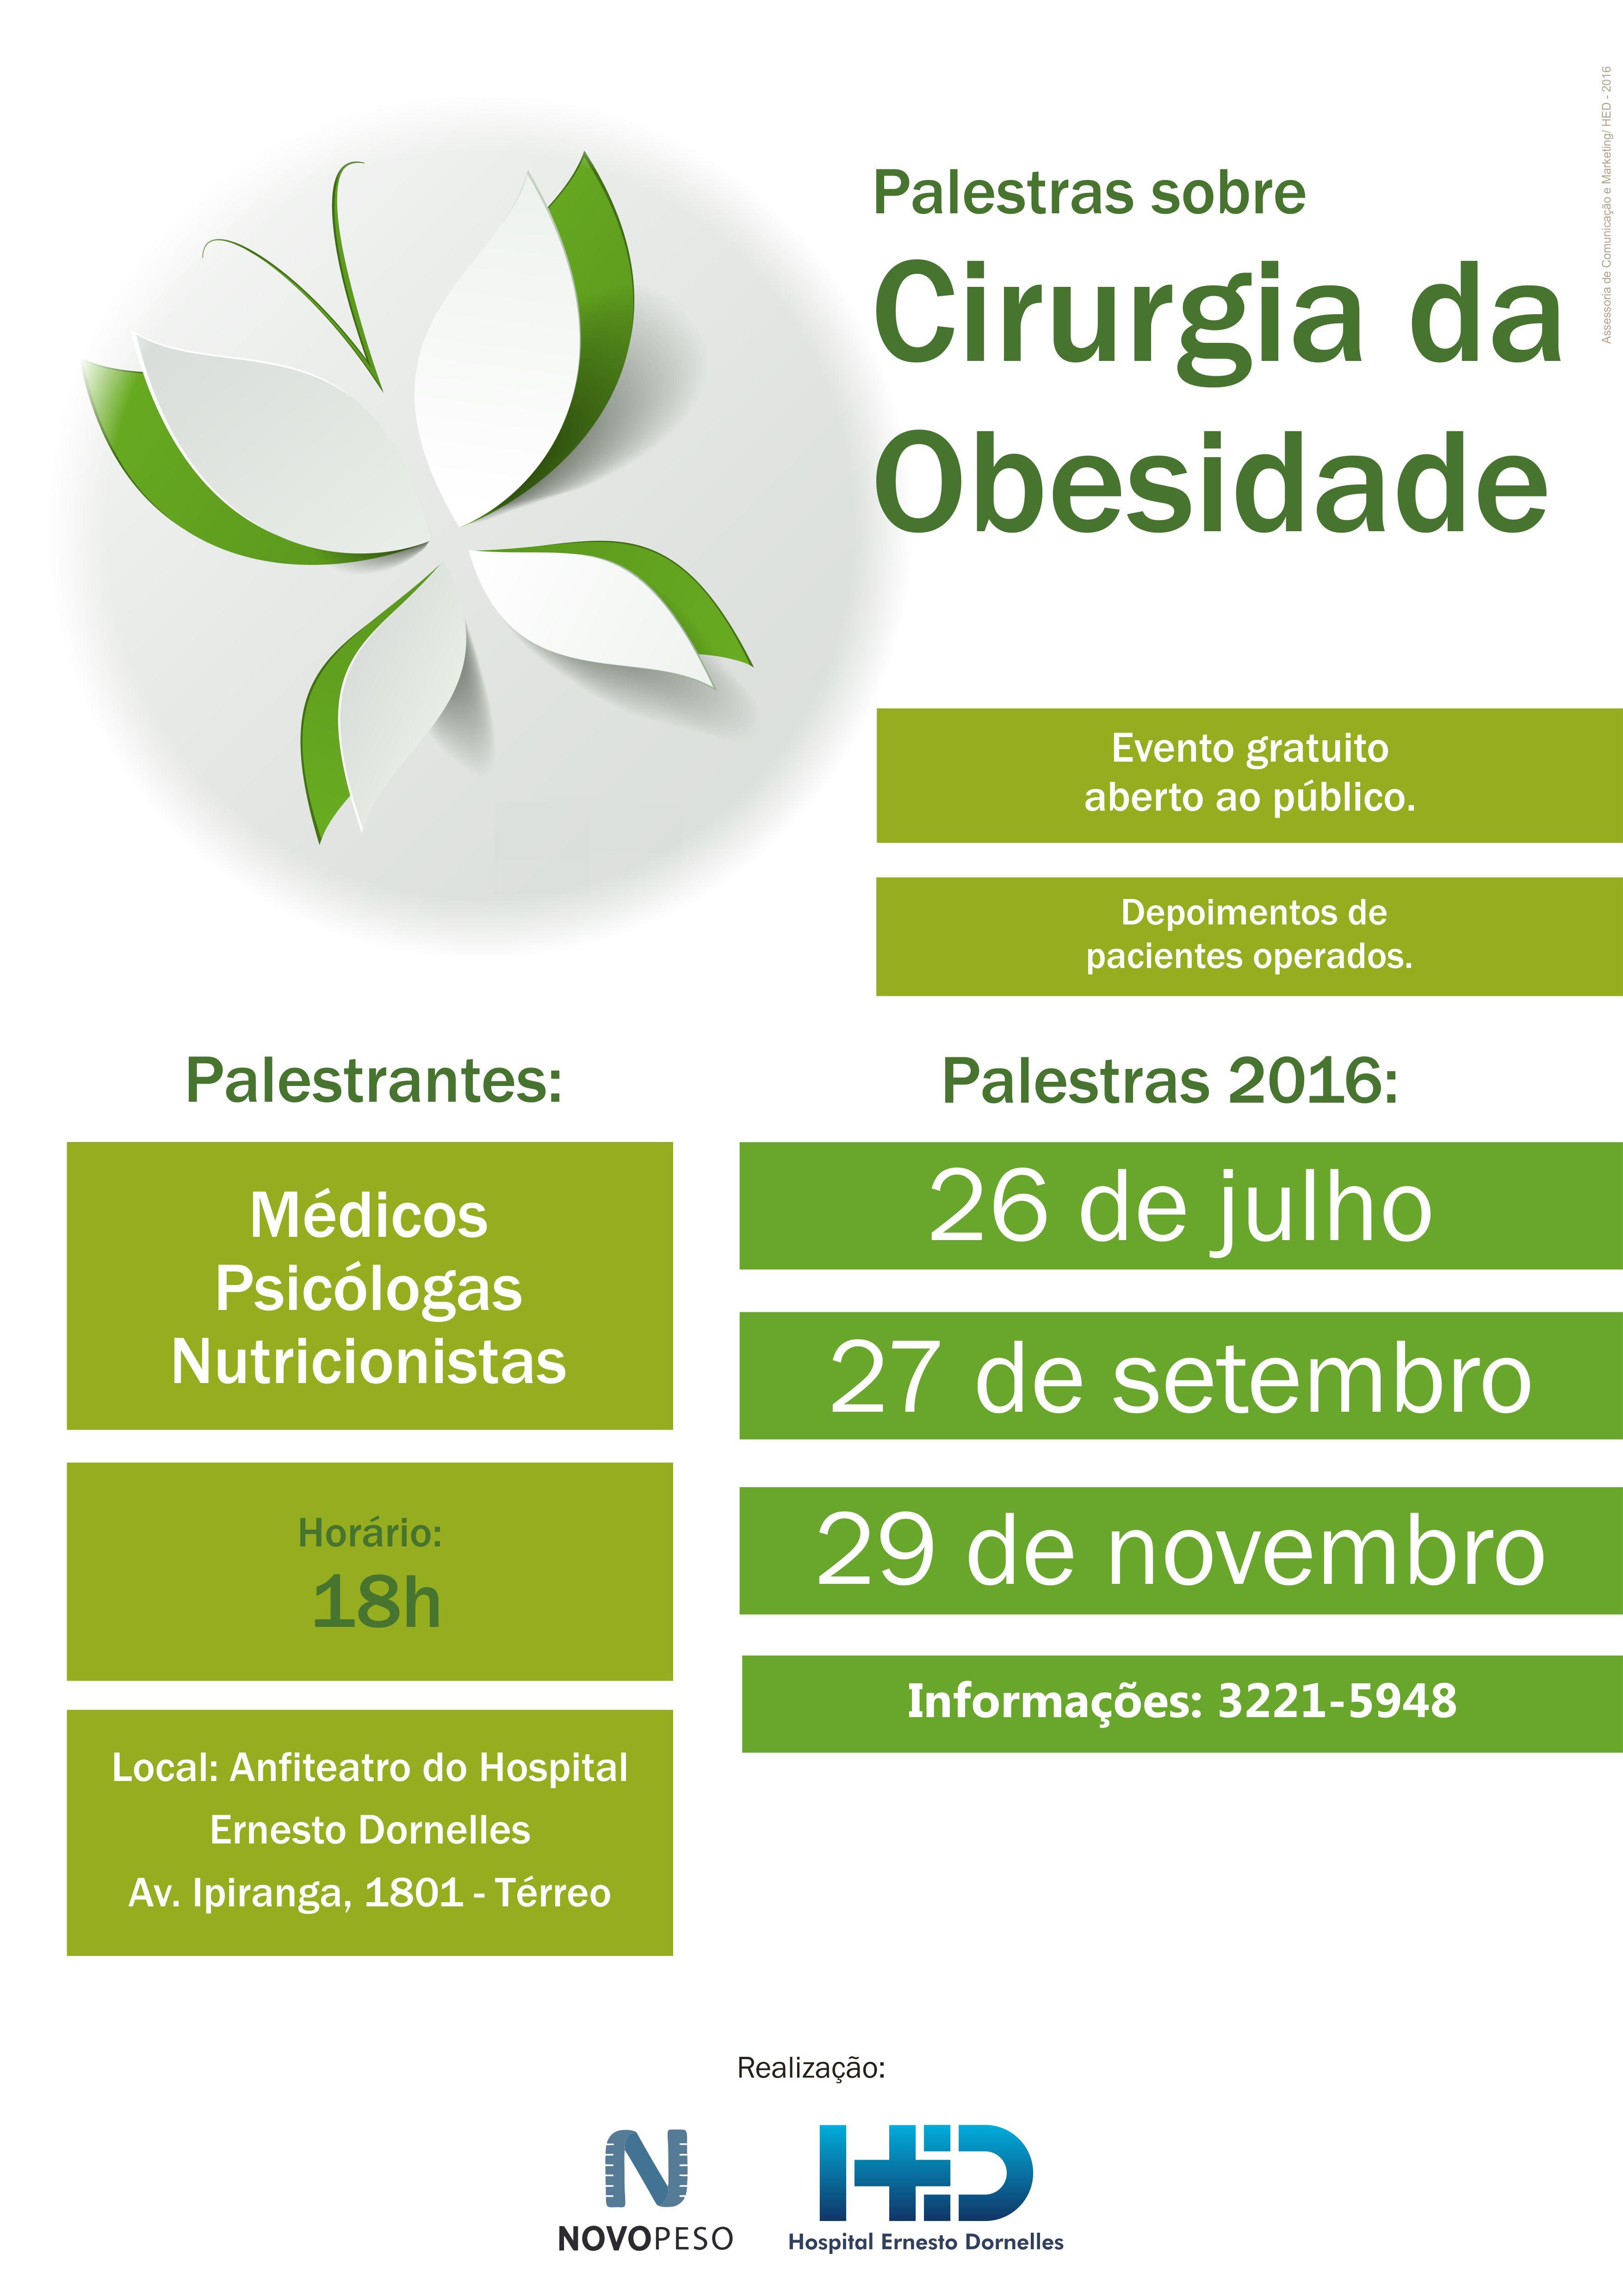 Palestras sobre Cirurgia e Obesidade 2016 7bec5f9d85